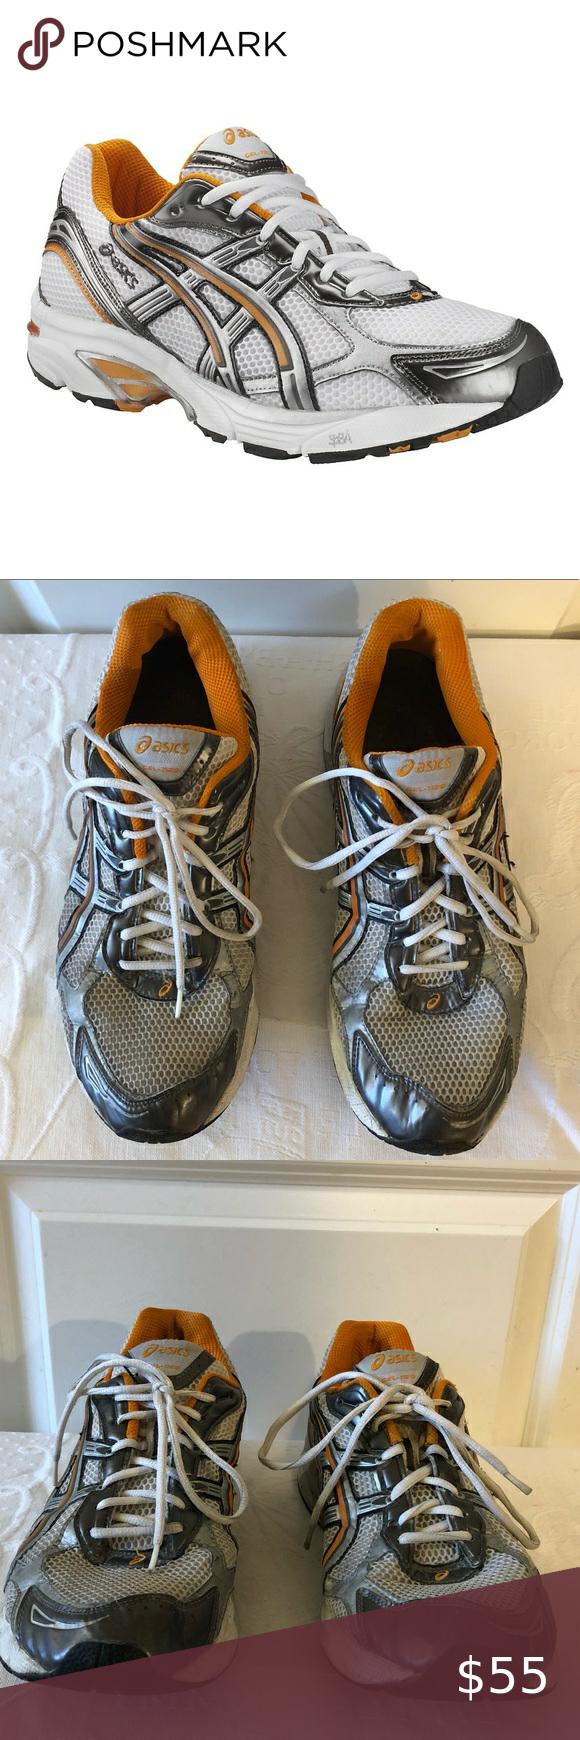 Asics Gel Kahana Orange Running Shoes | Running shoes, Shoes, Asics